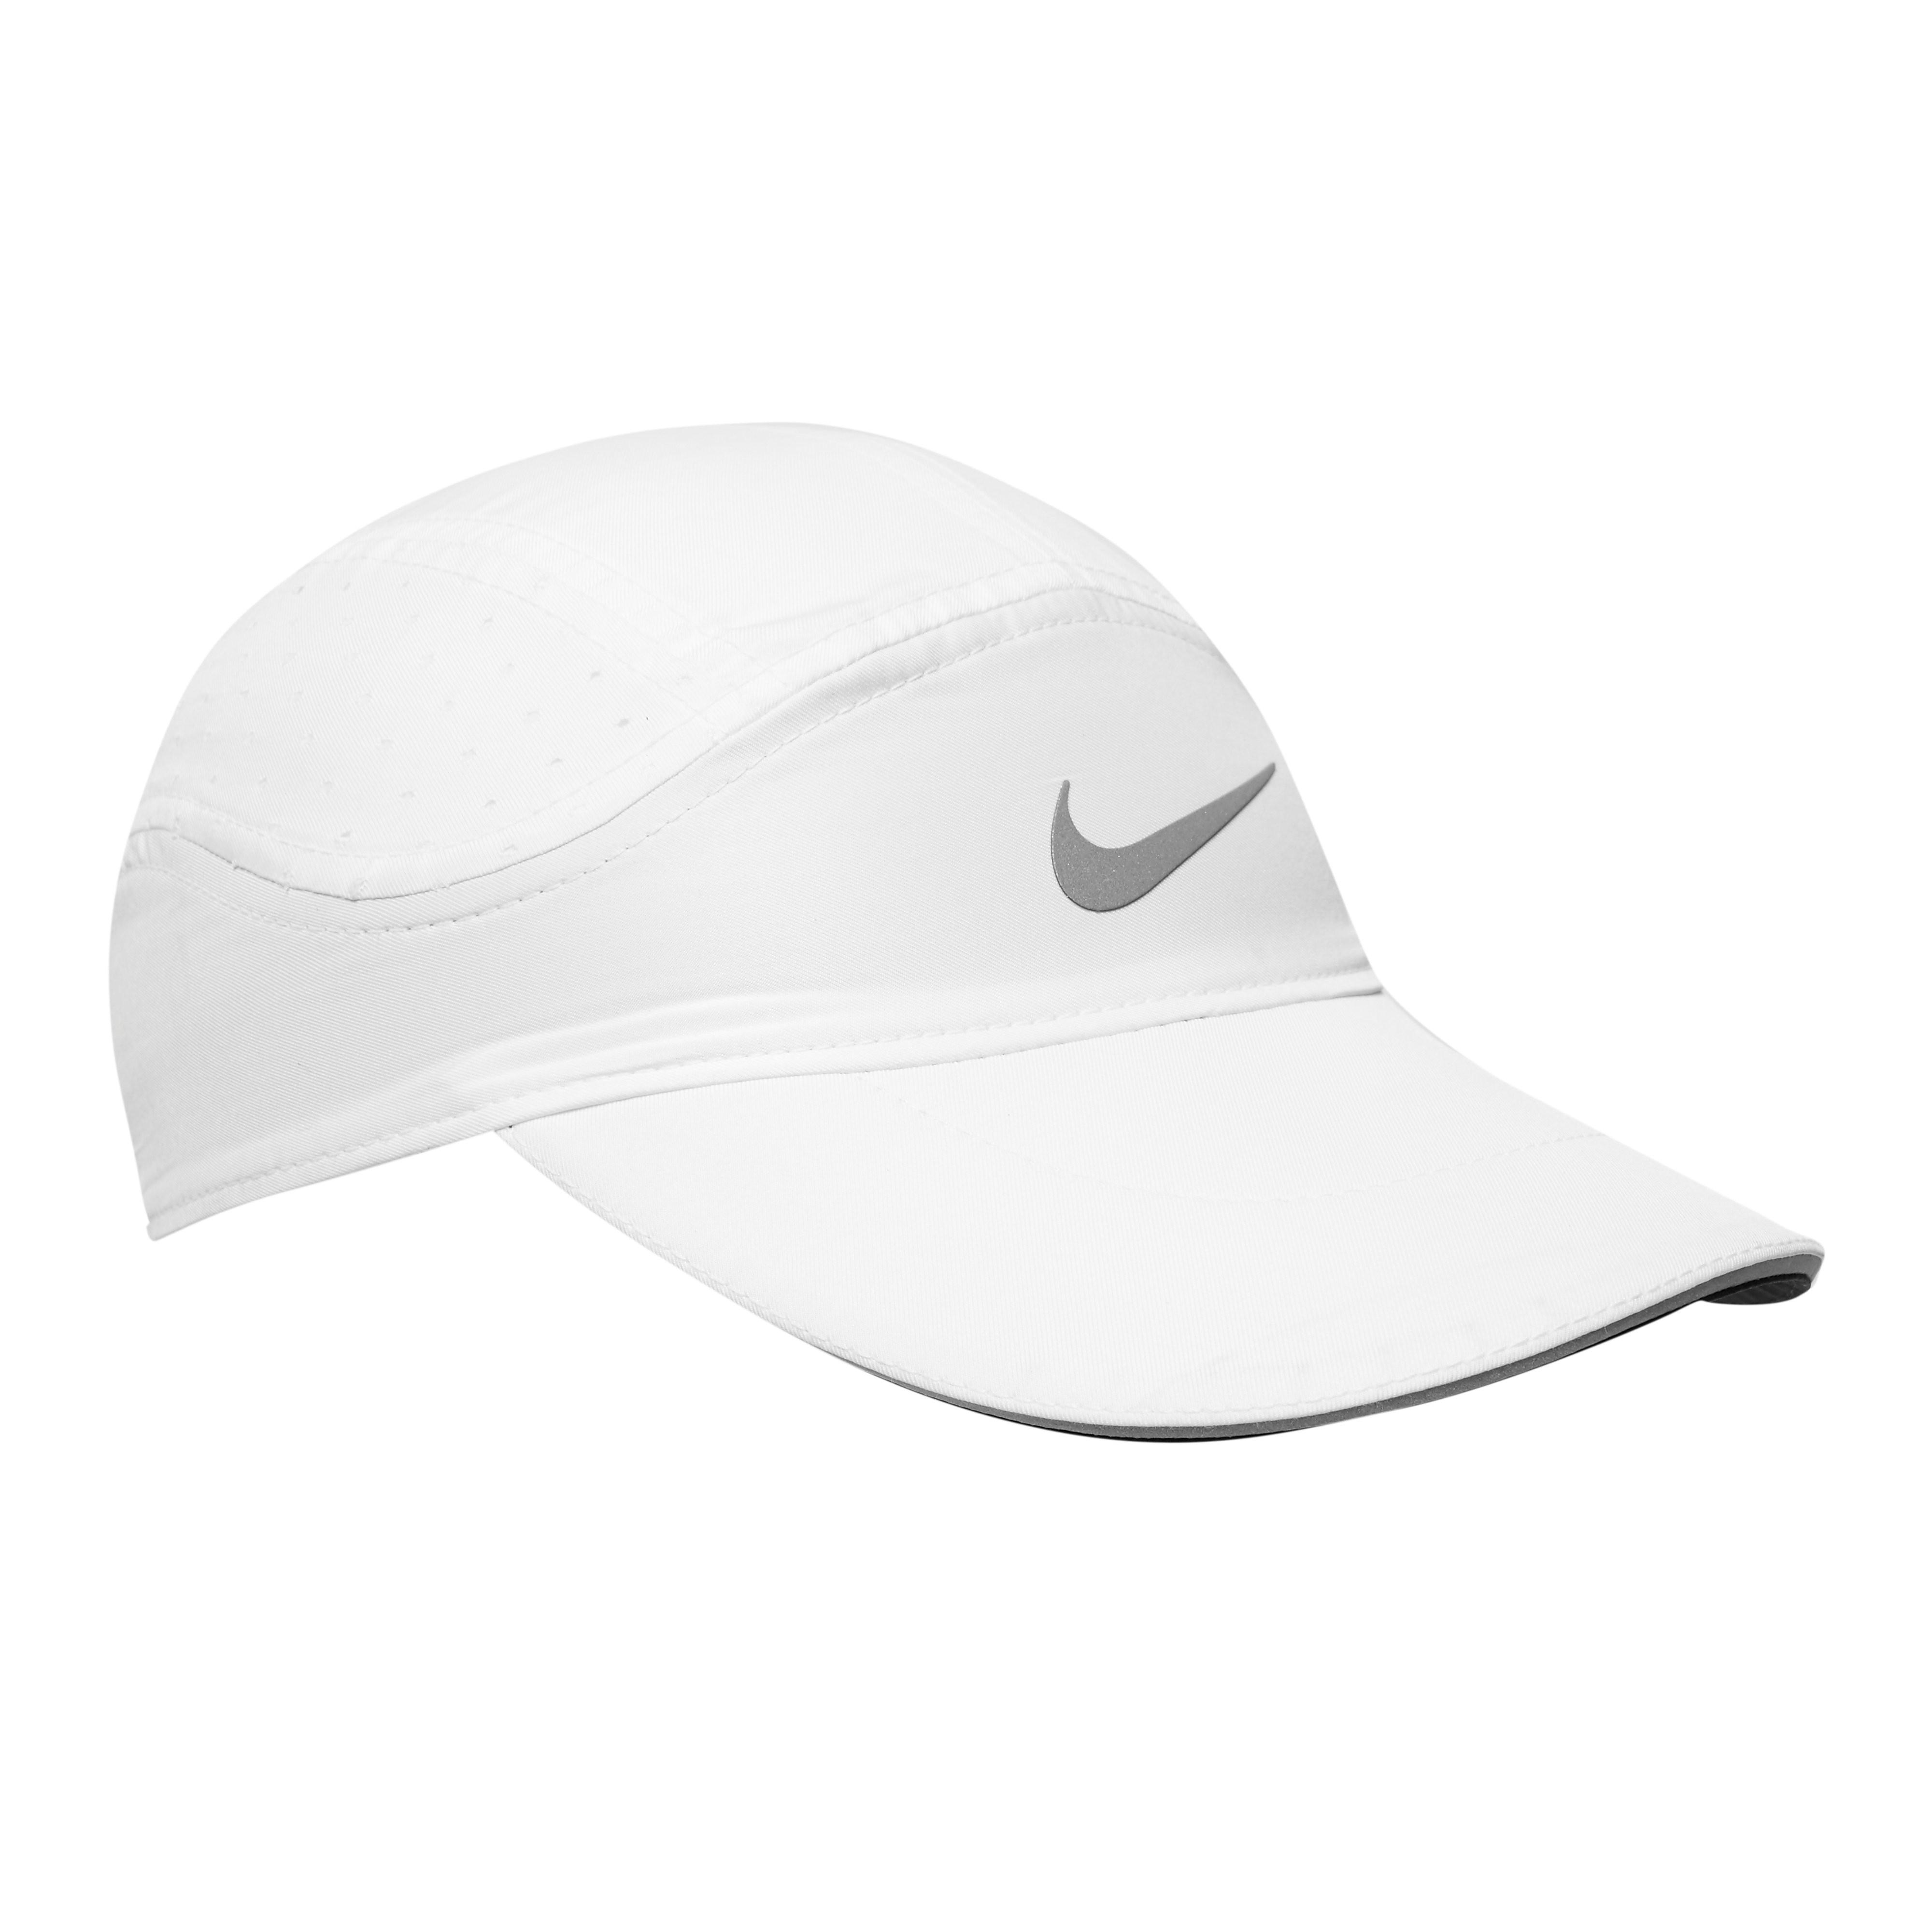 Nike AeroBill Women's Running Cap